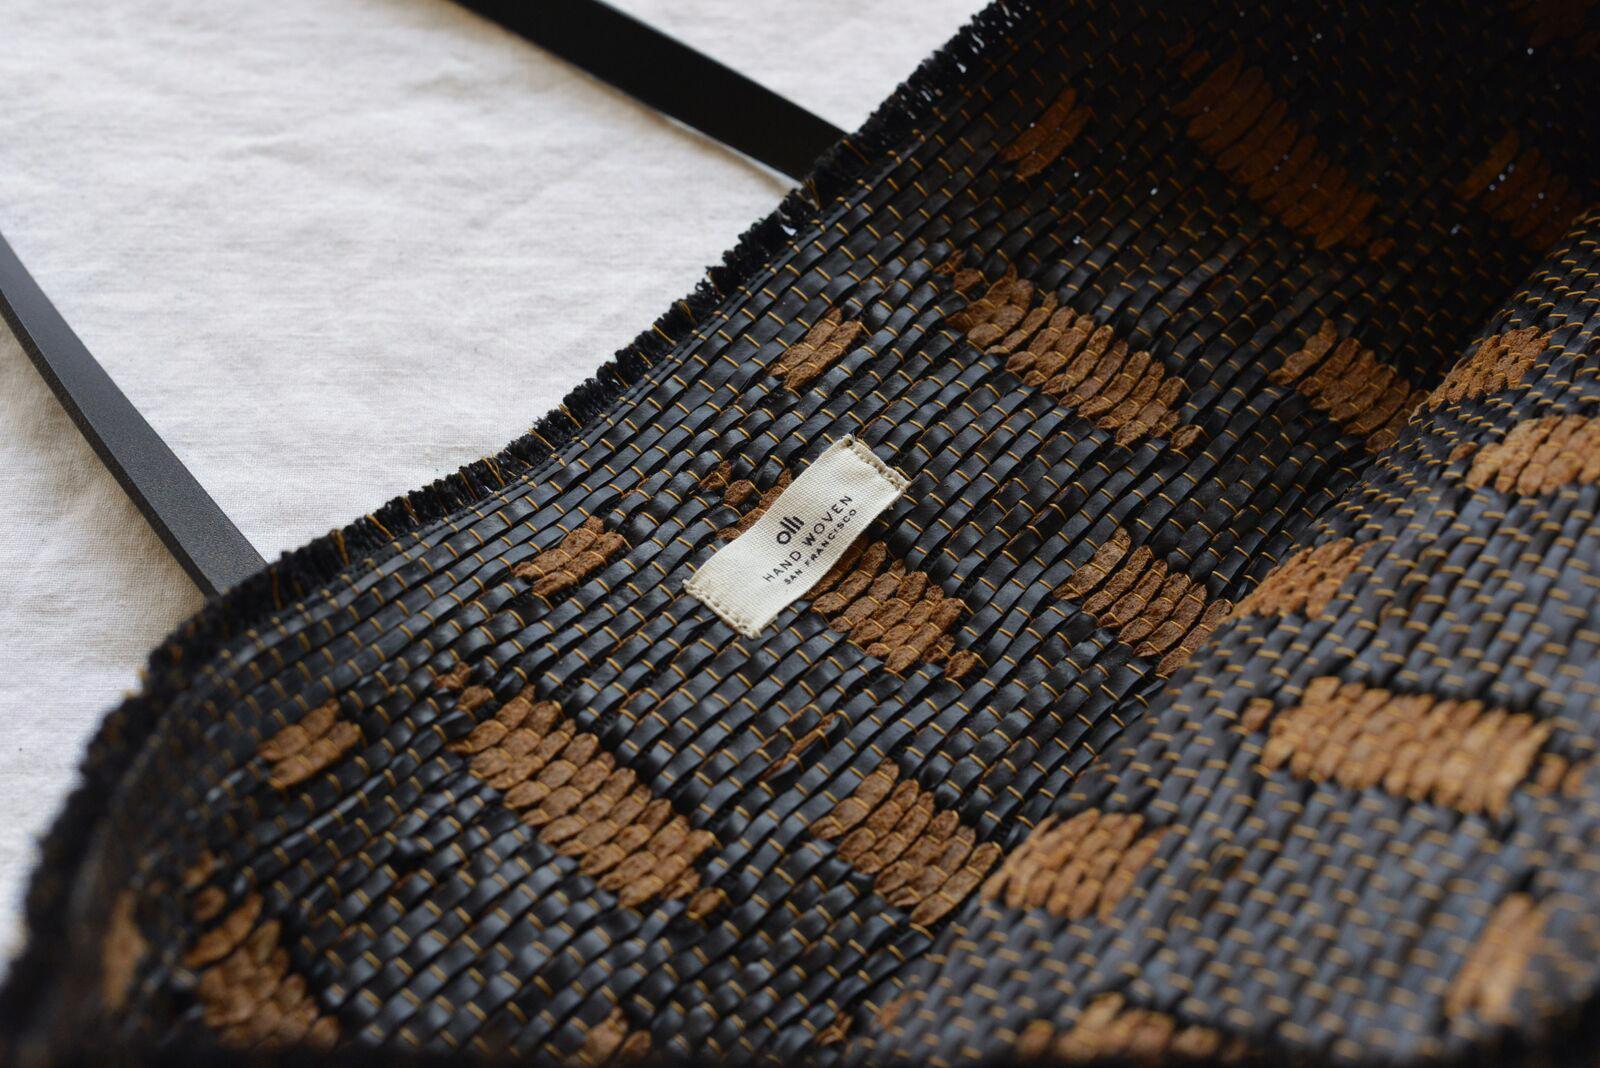 Myriad---innertube-and-brown-leather_02_web.jpg